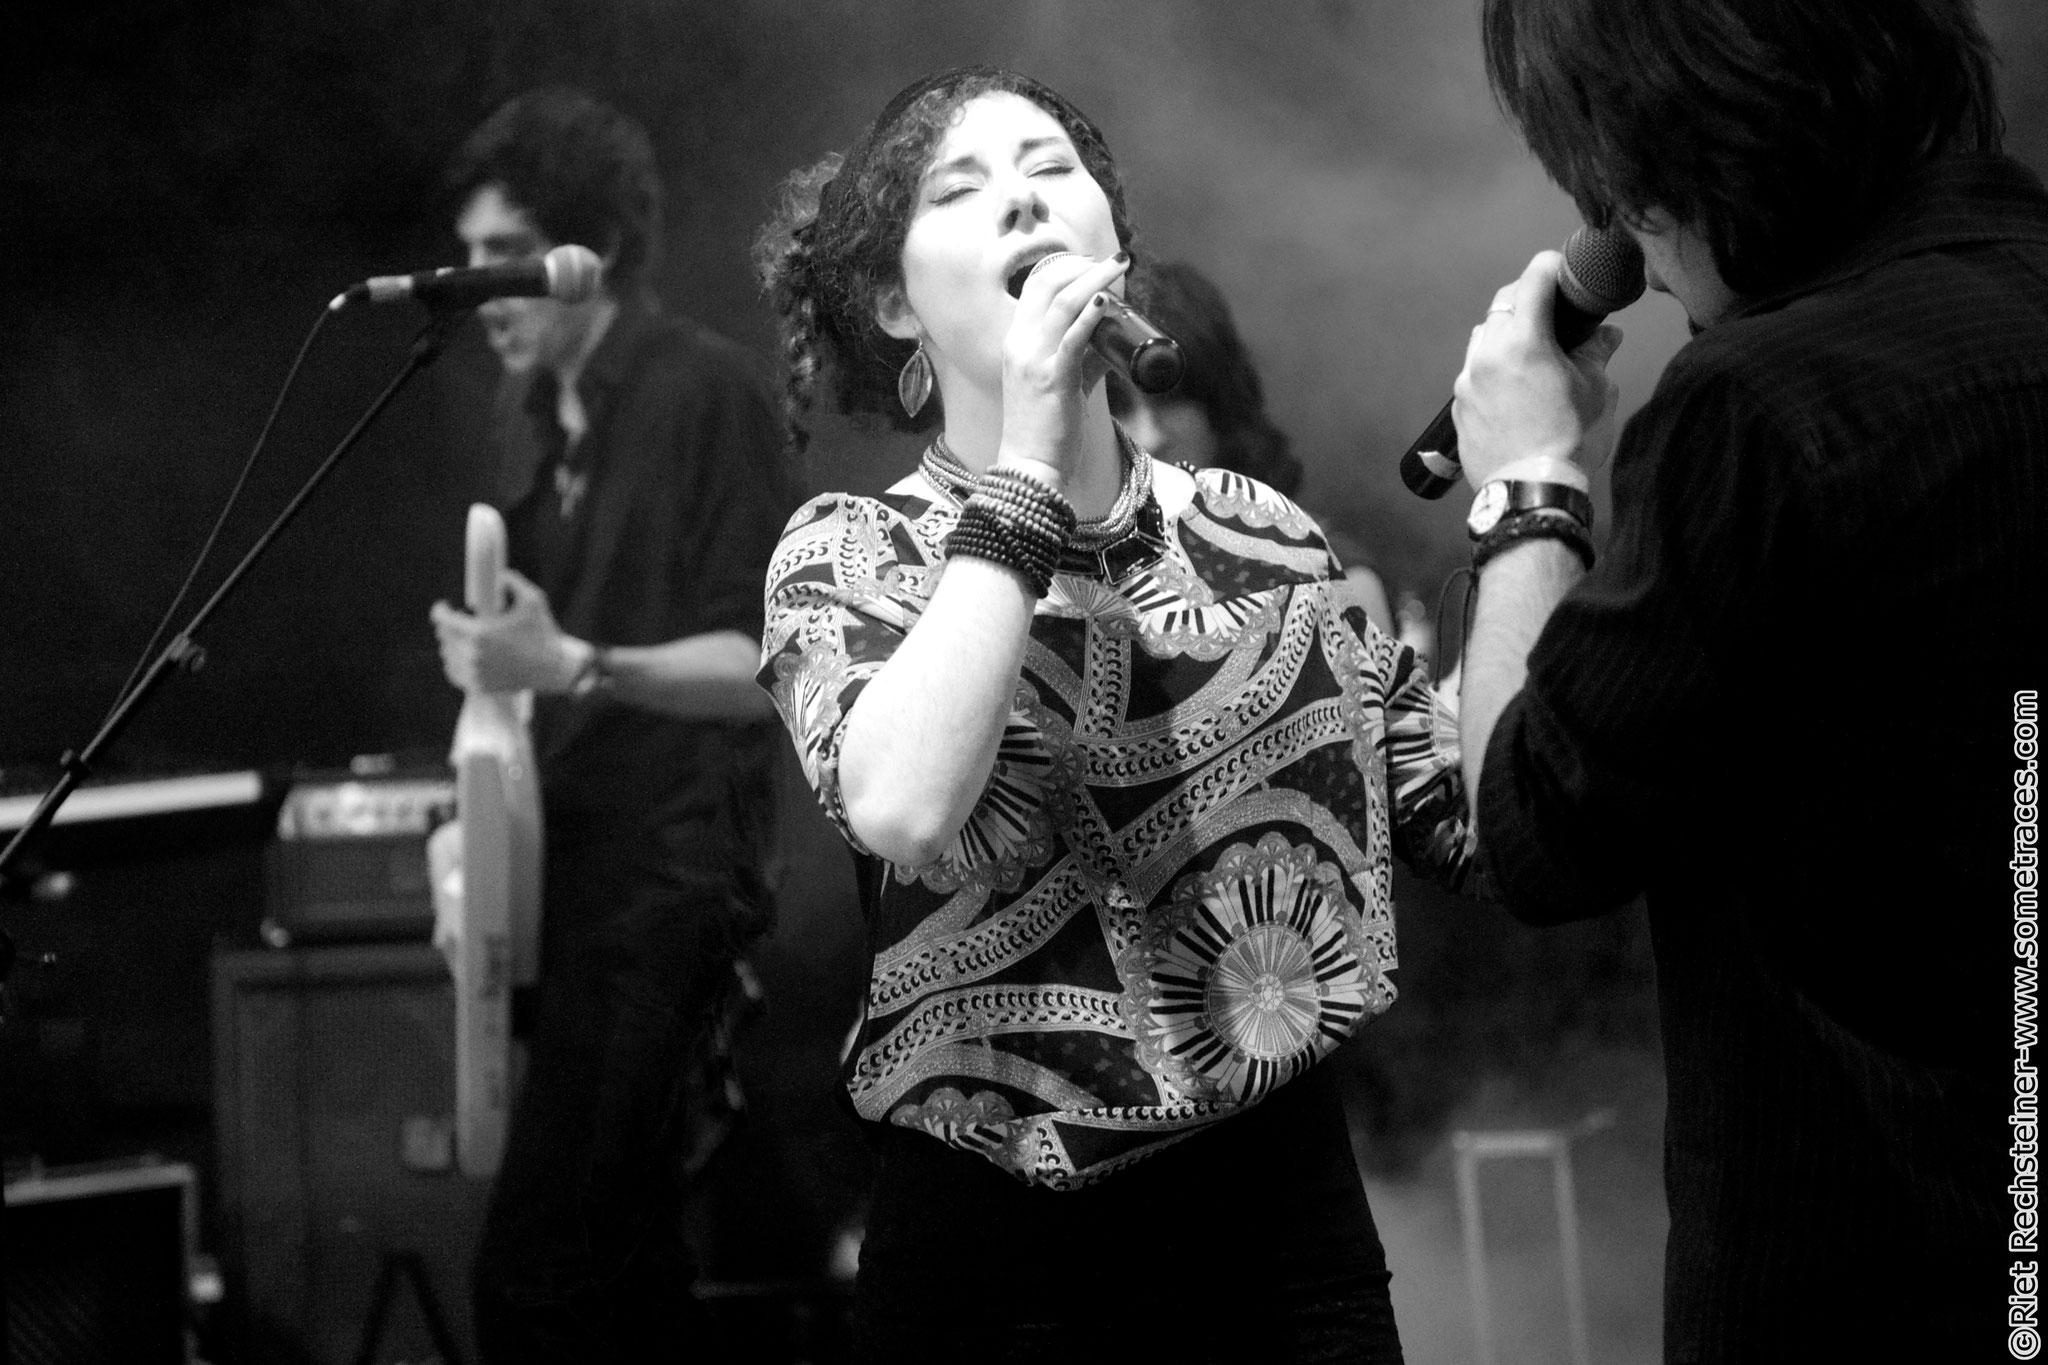 01.02.2013 Lugano